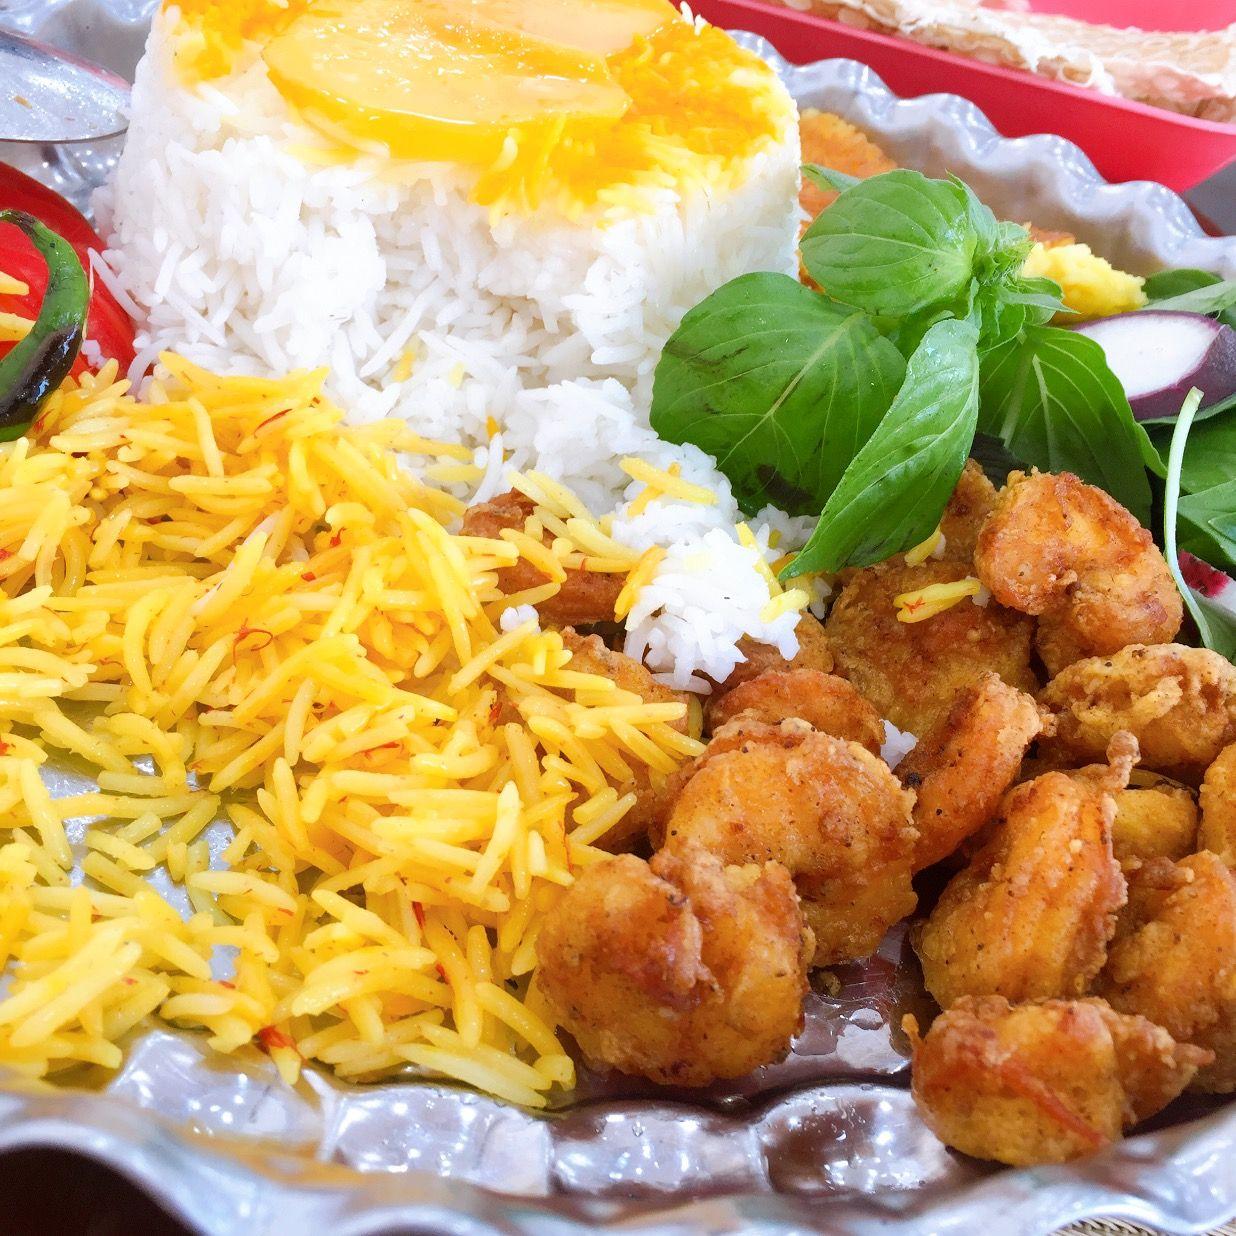 #food•#love•#instagood•#foodporn•#foodie•#follow•#photooftheday•#followme•#happy•#picoftheday•#fitne...